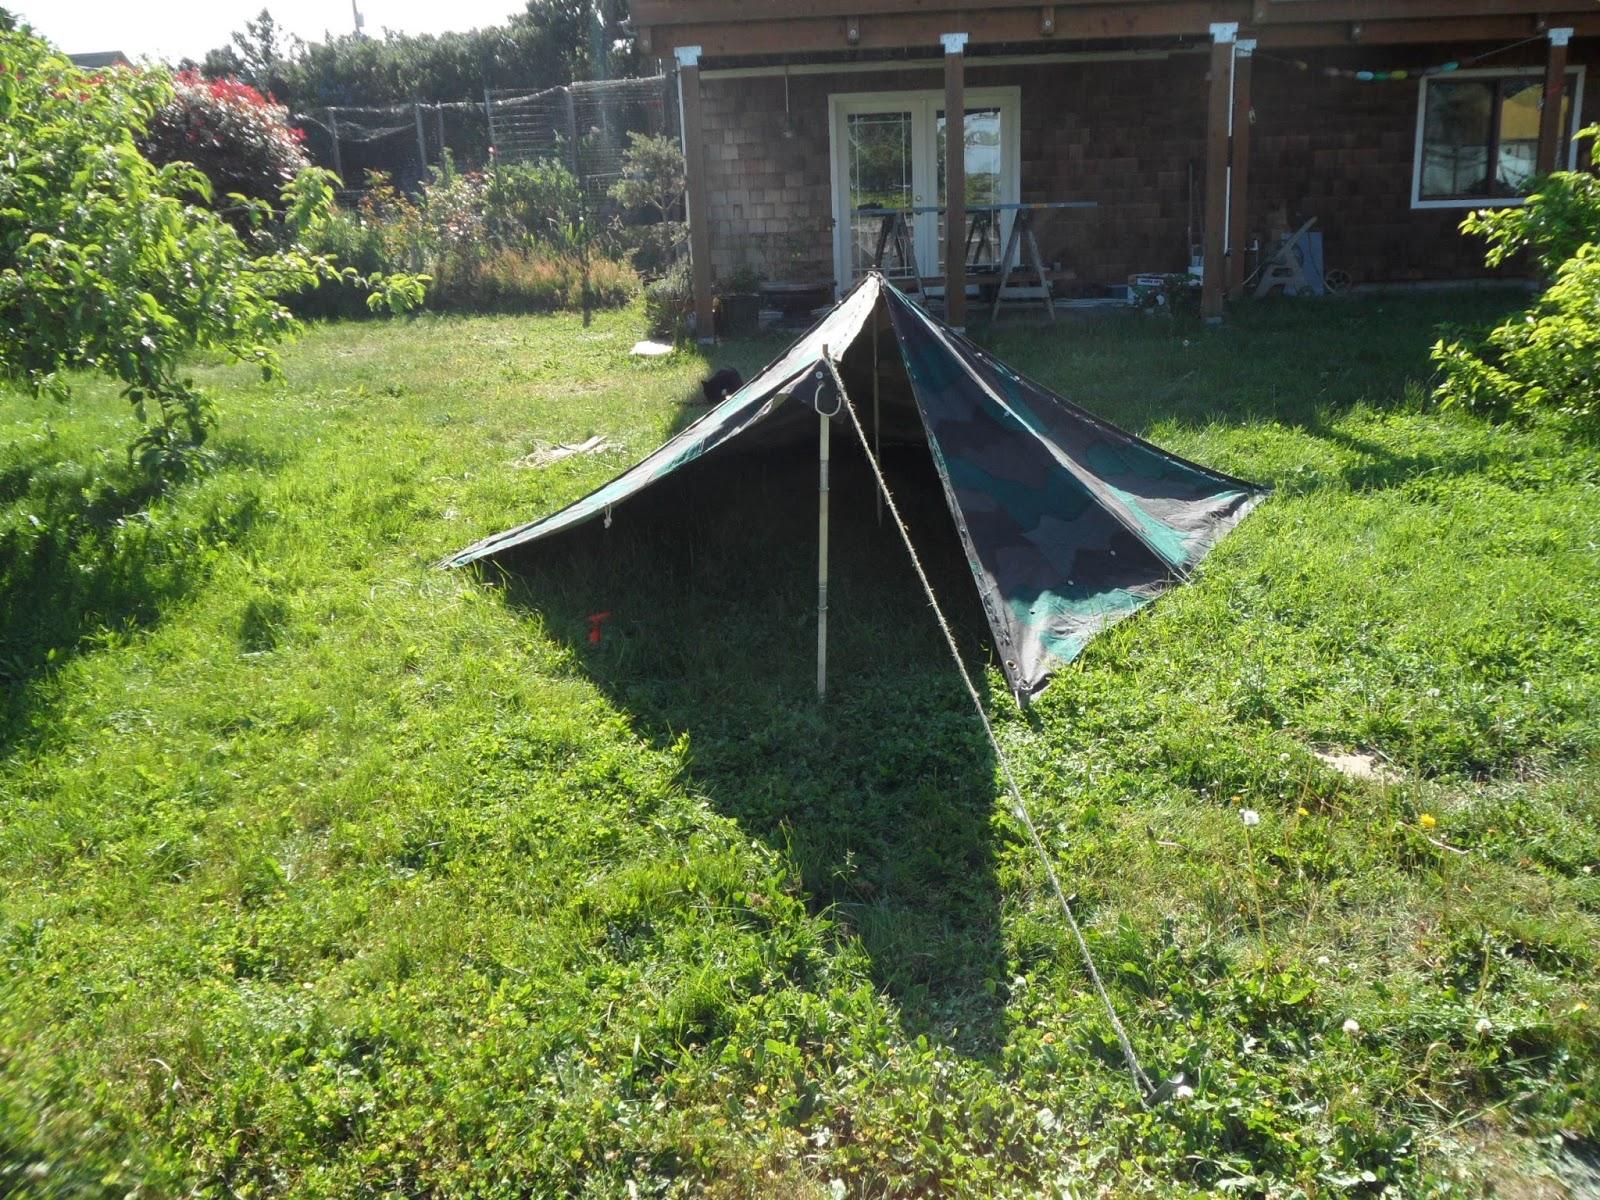 Swedish Zeltbahn Tent Set-Up & Four Bees: Swedish Zeltbahn Tent Set-Up